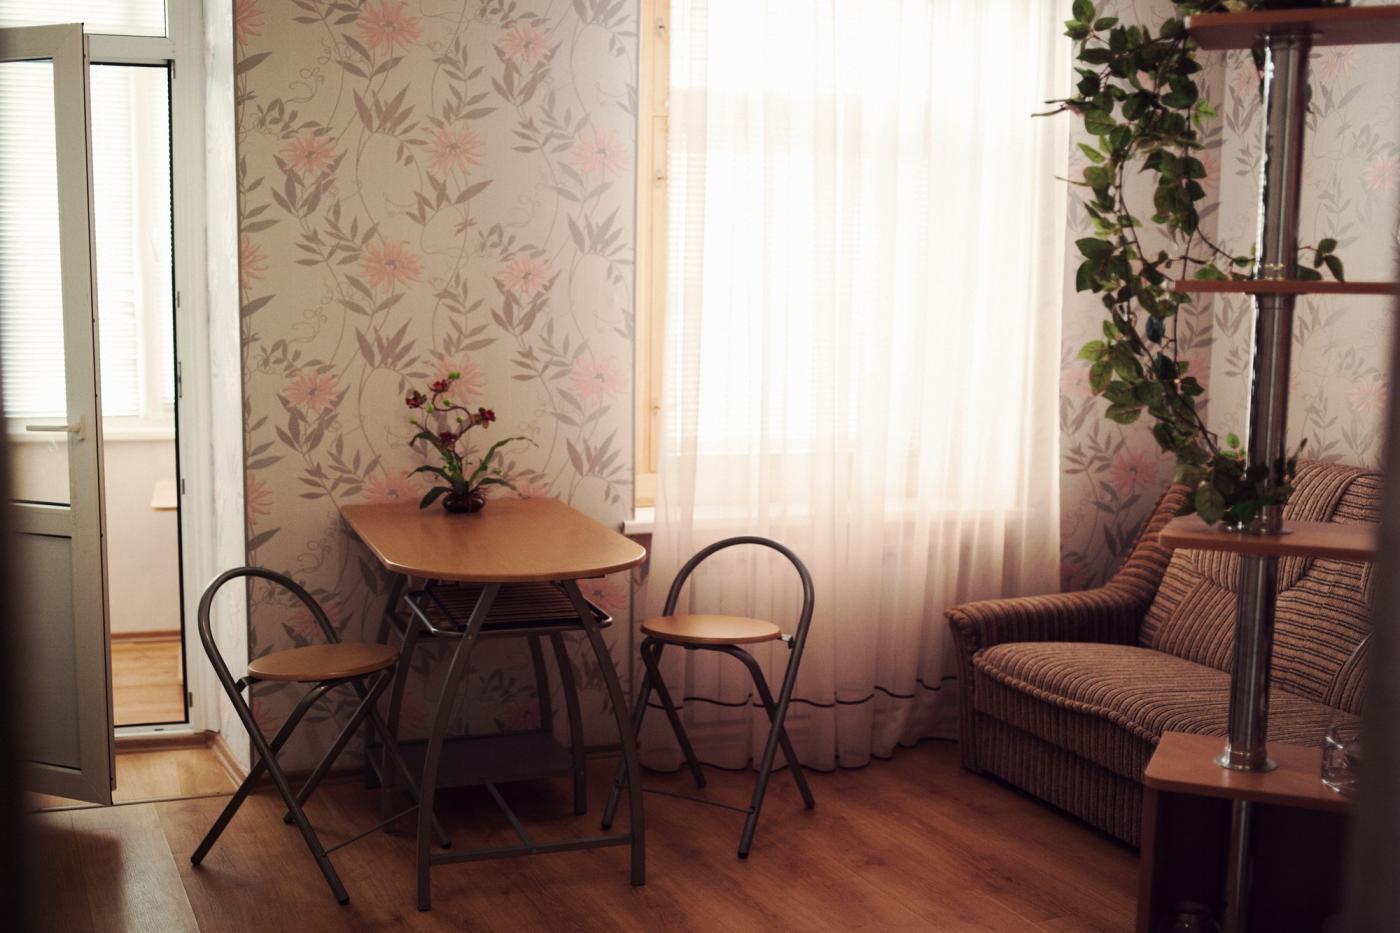 2-комнатная квартира посуточно (вариант № 1536), ул. Воронина улица, фото № 5